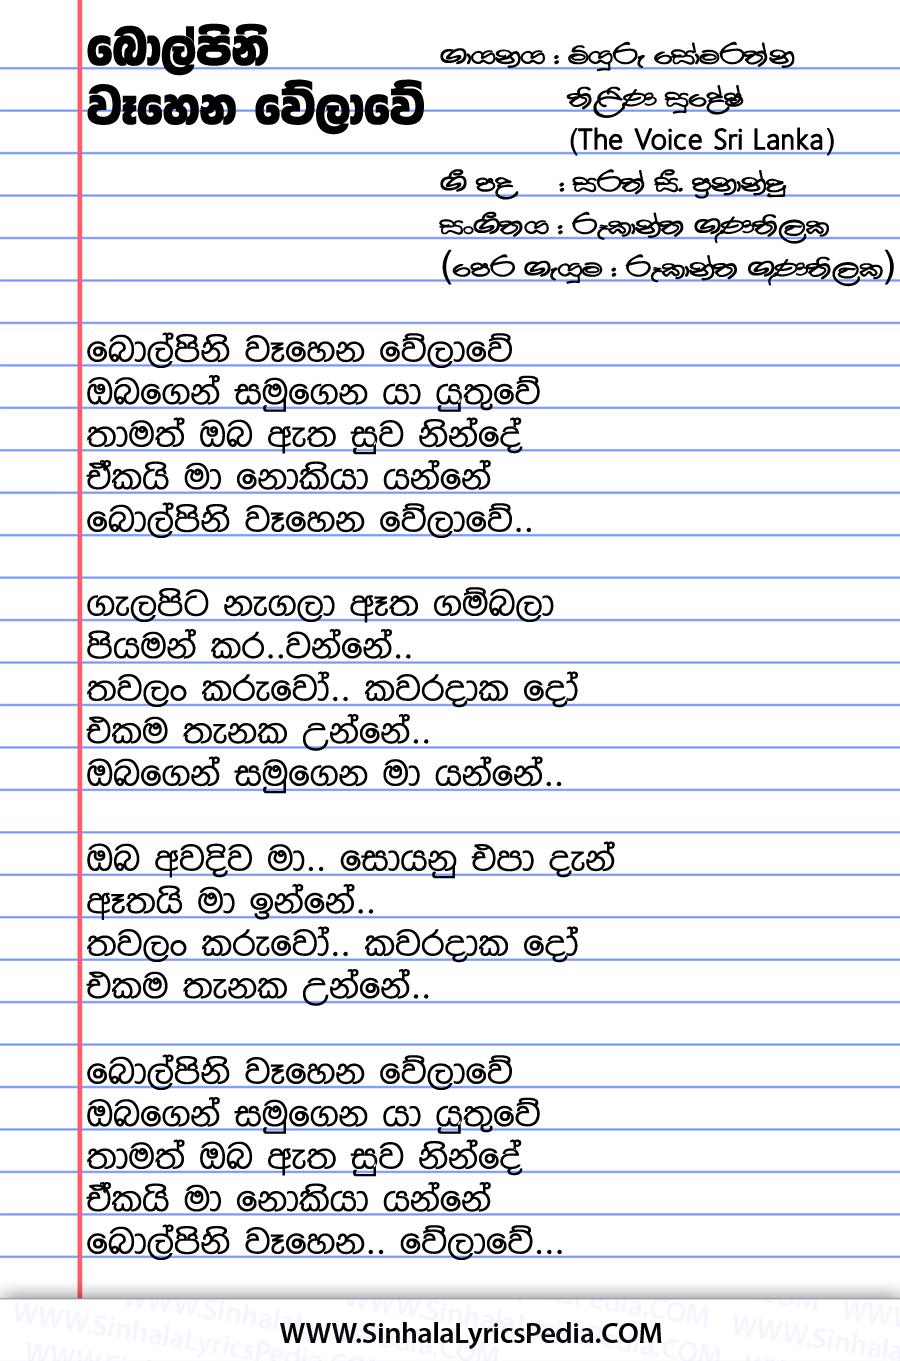 Bol Pini Wahena Welawe Song Lyrics